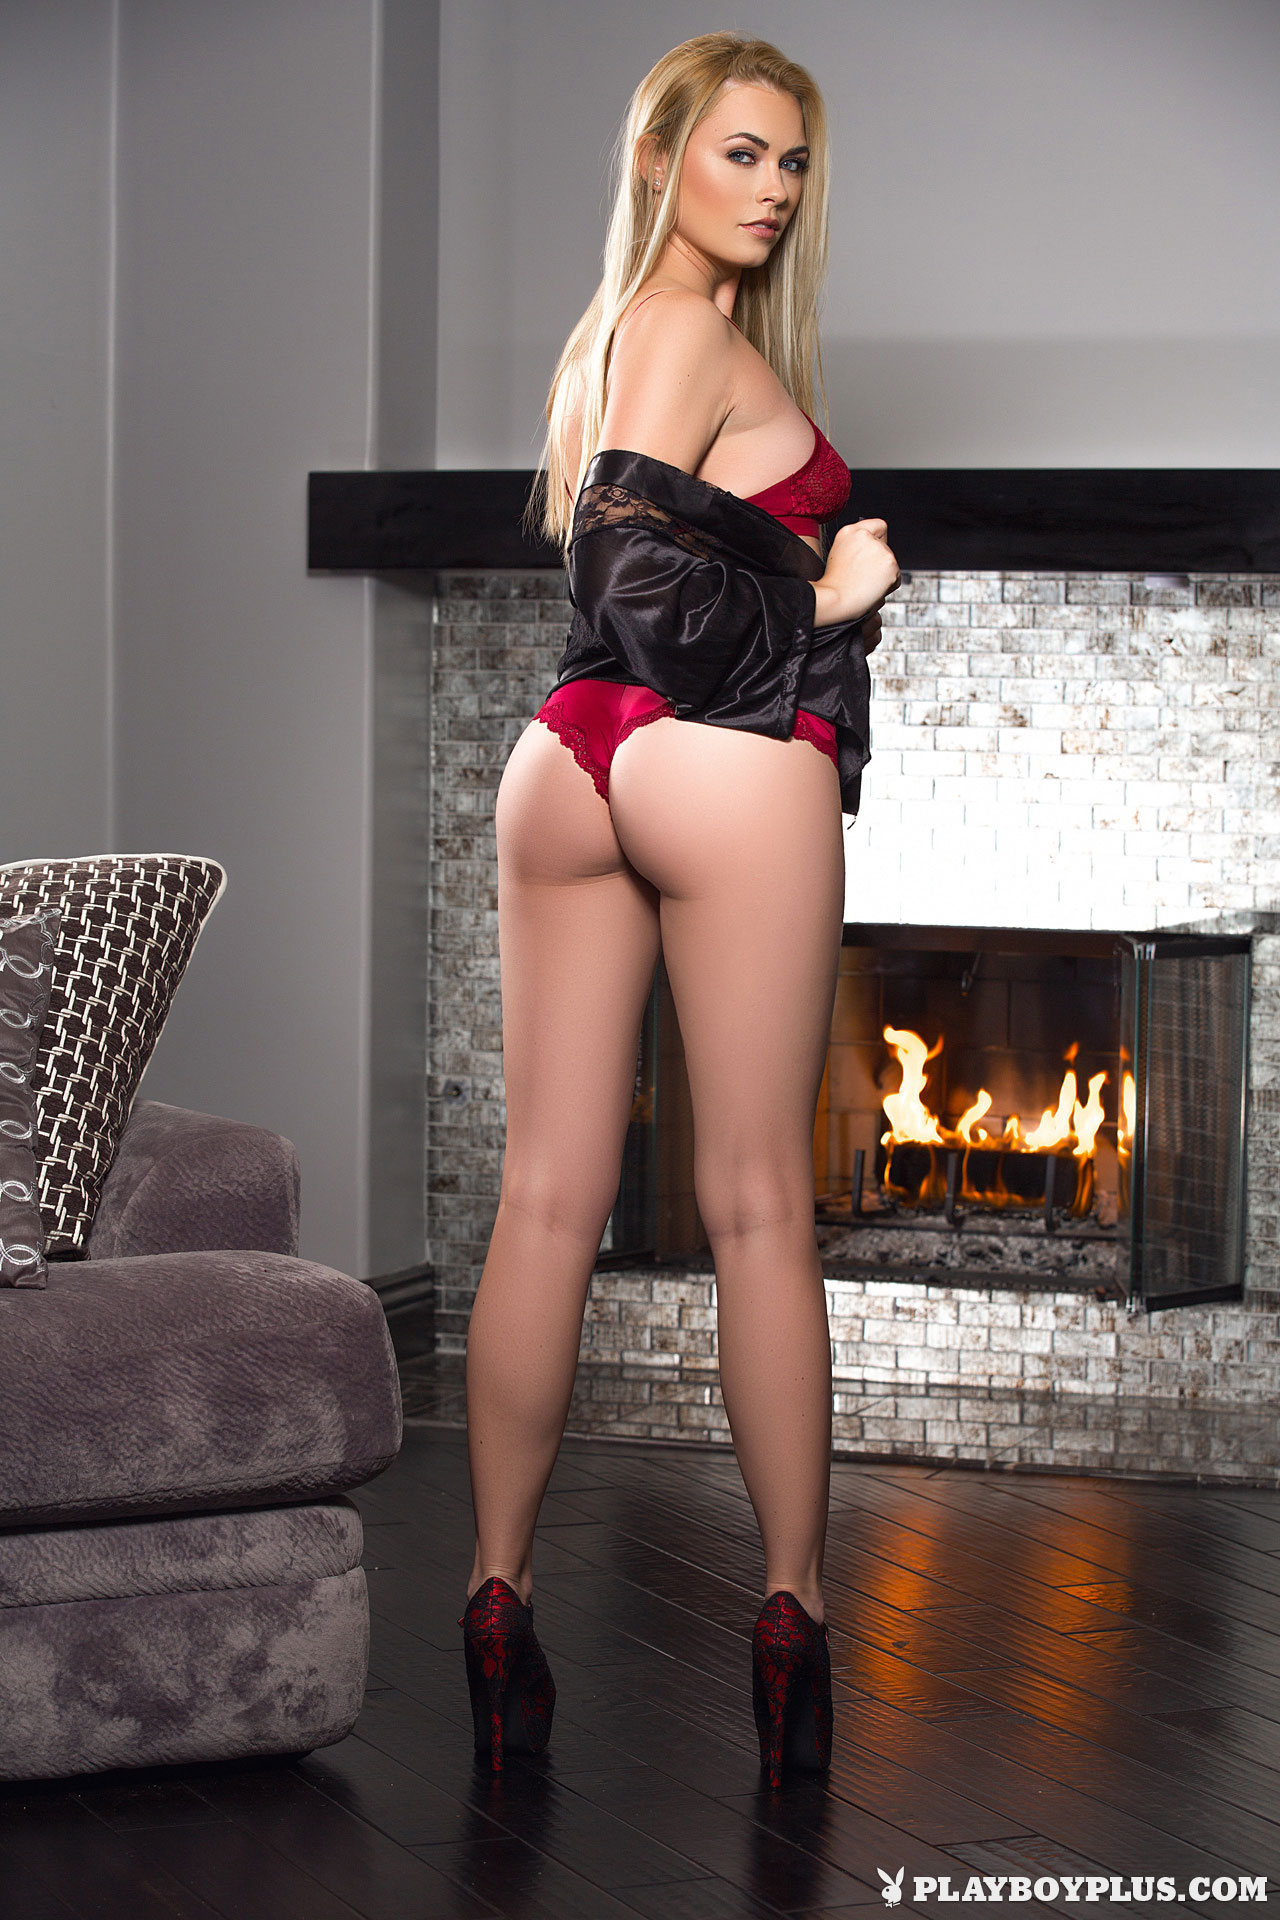 bailey-rayne-nude-fireplace-blonde-playboy-02